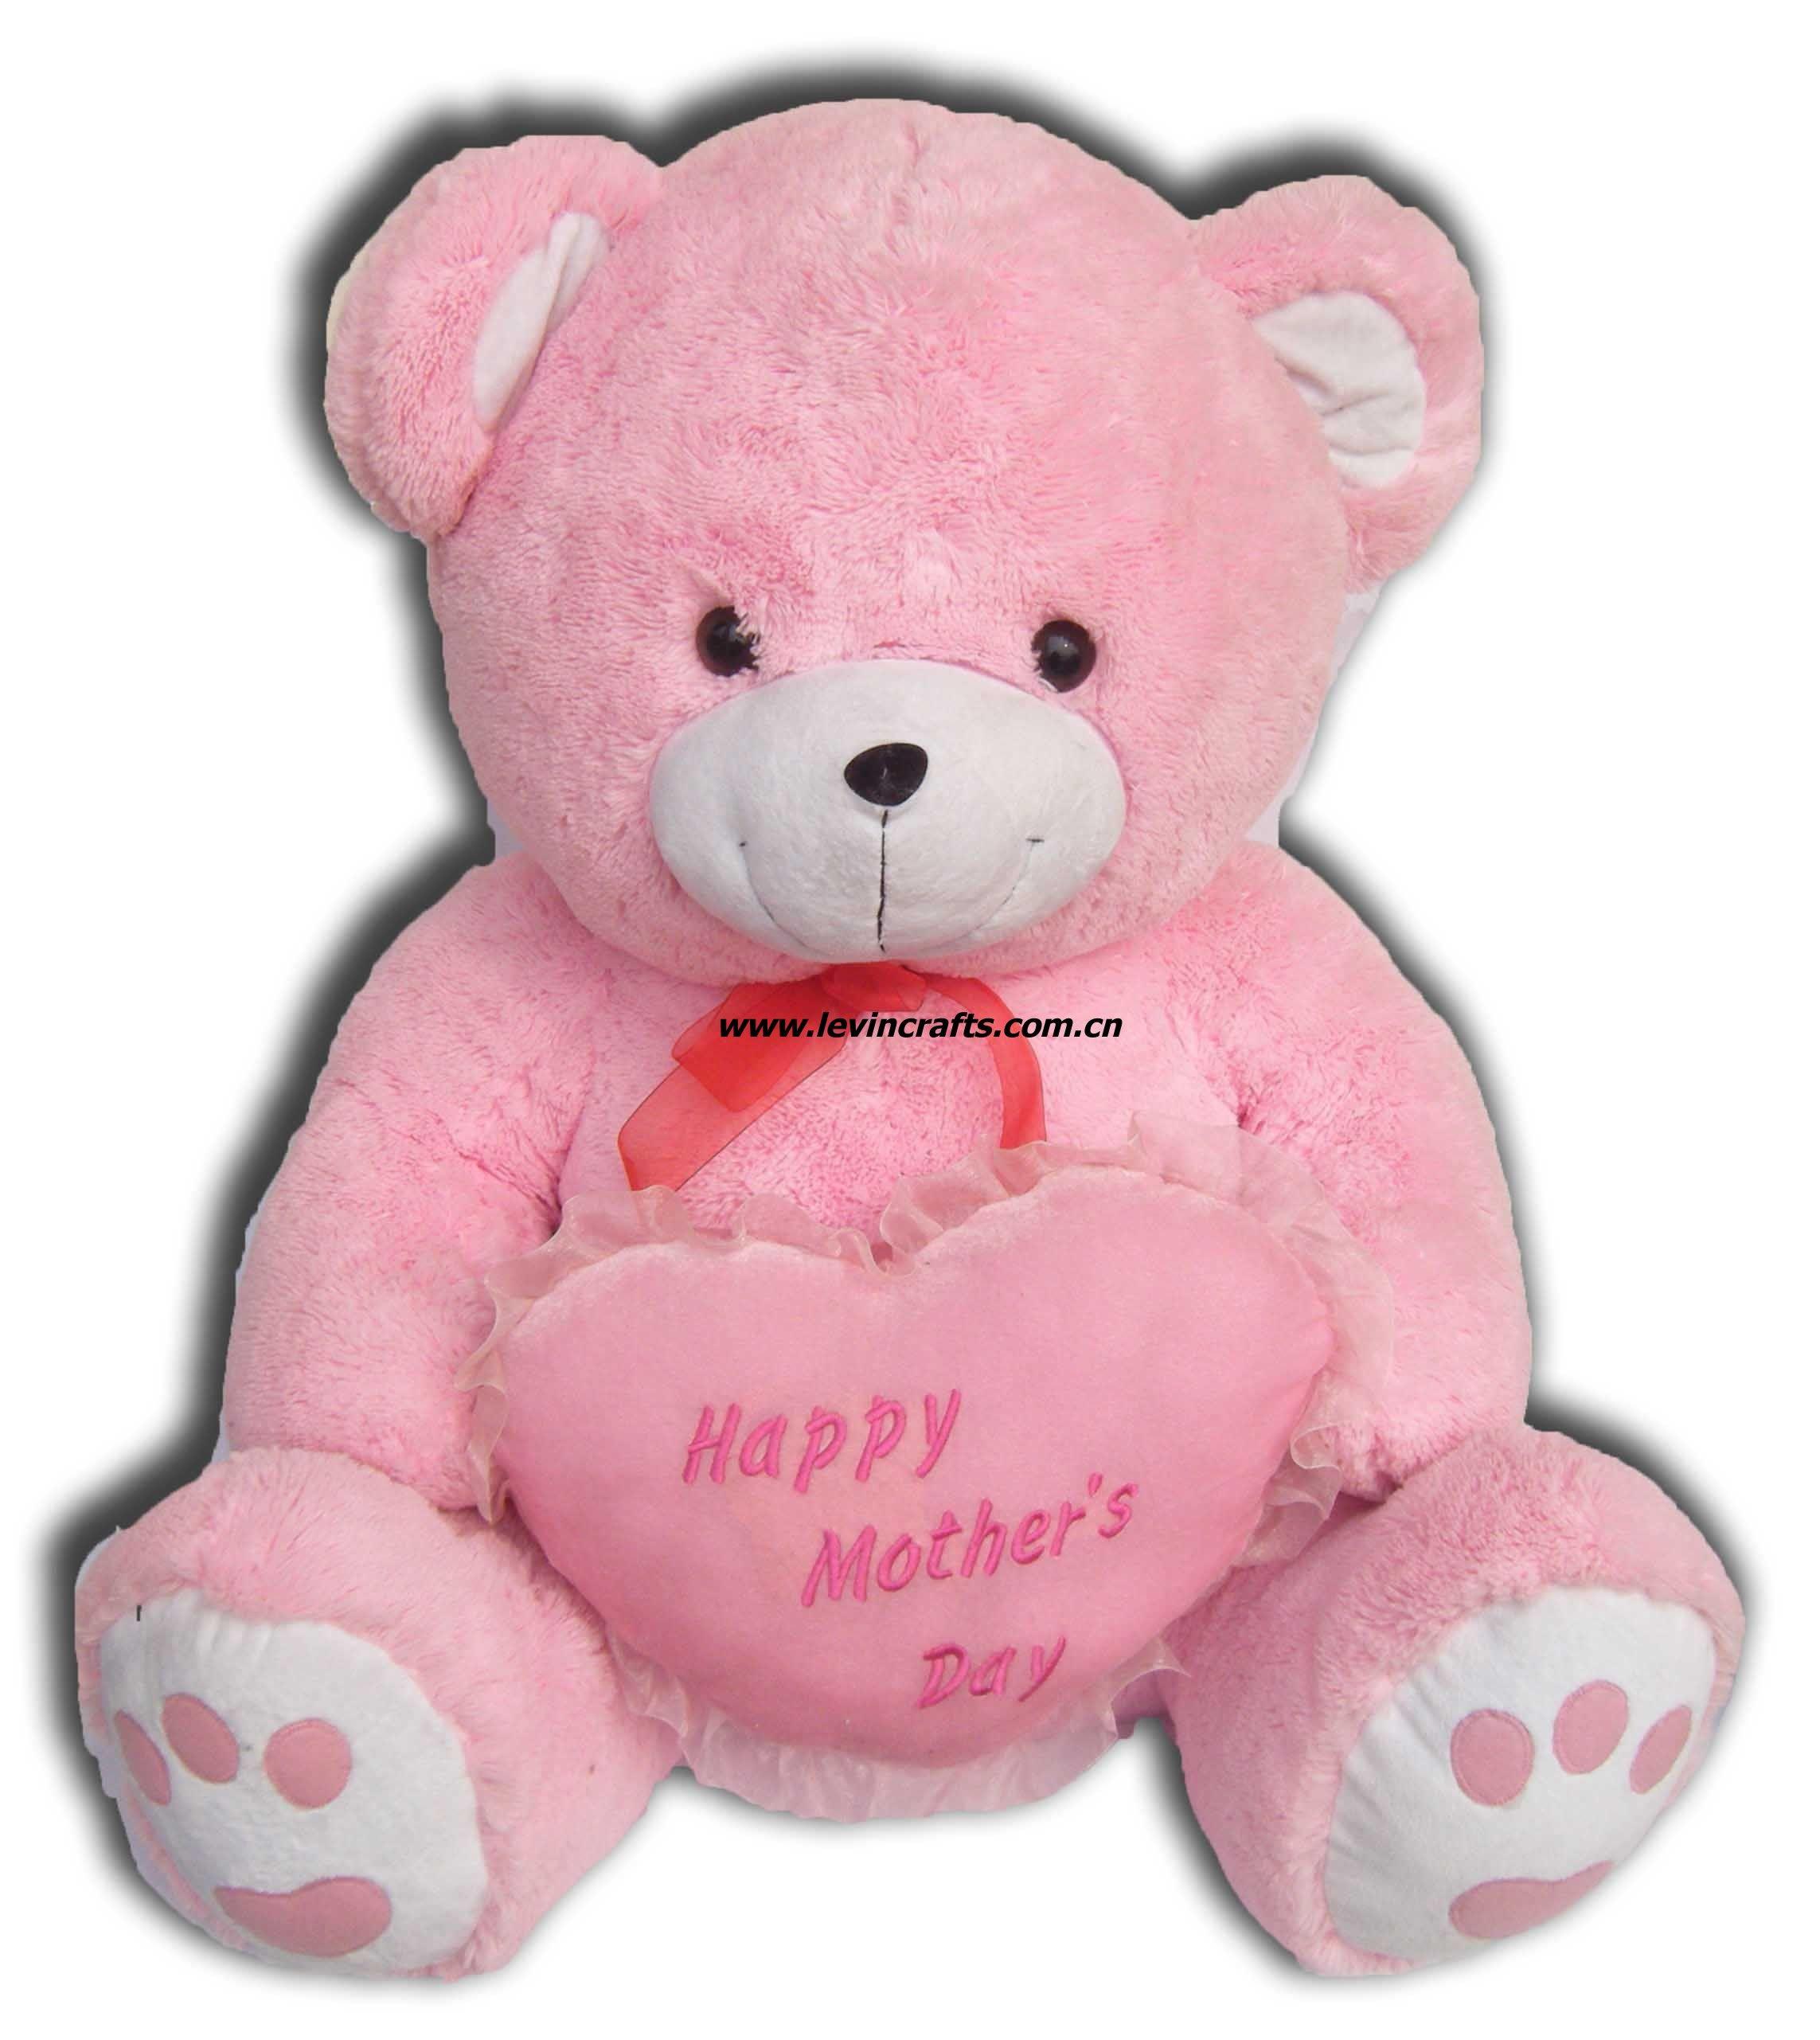 Cute pink teddy bear from